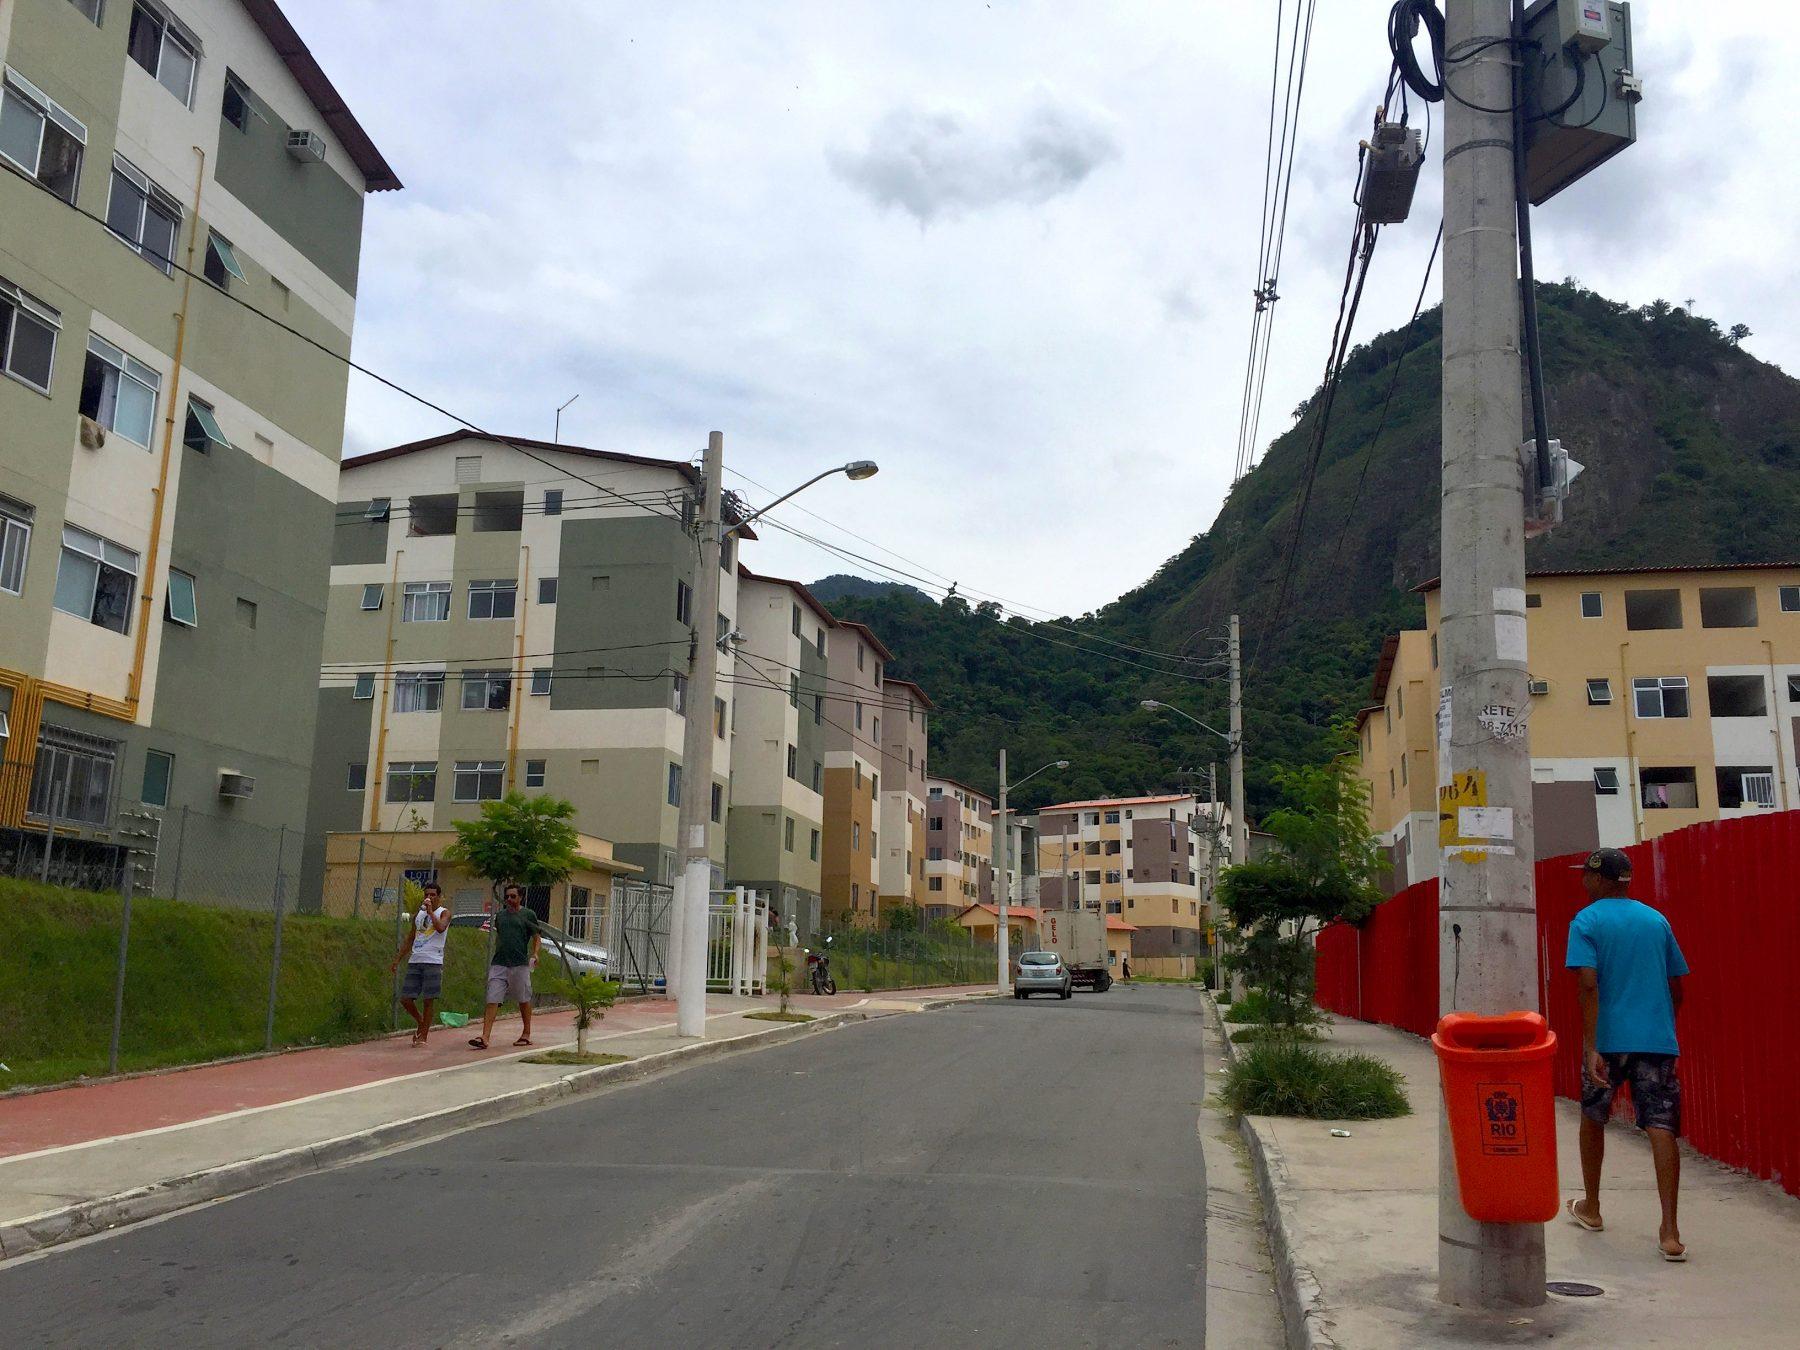 Gated lots line the main road into Parque Carioca.